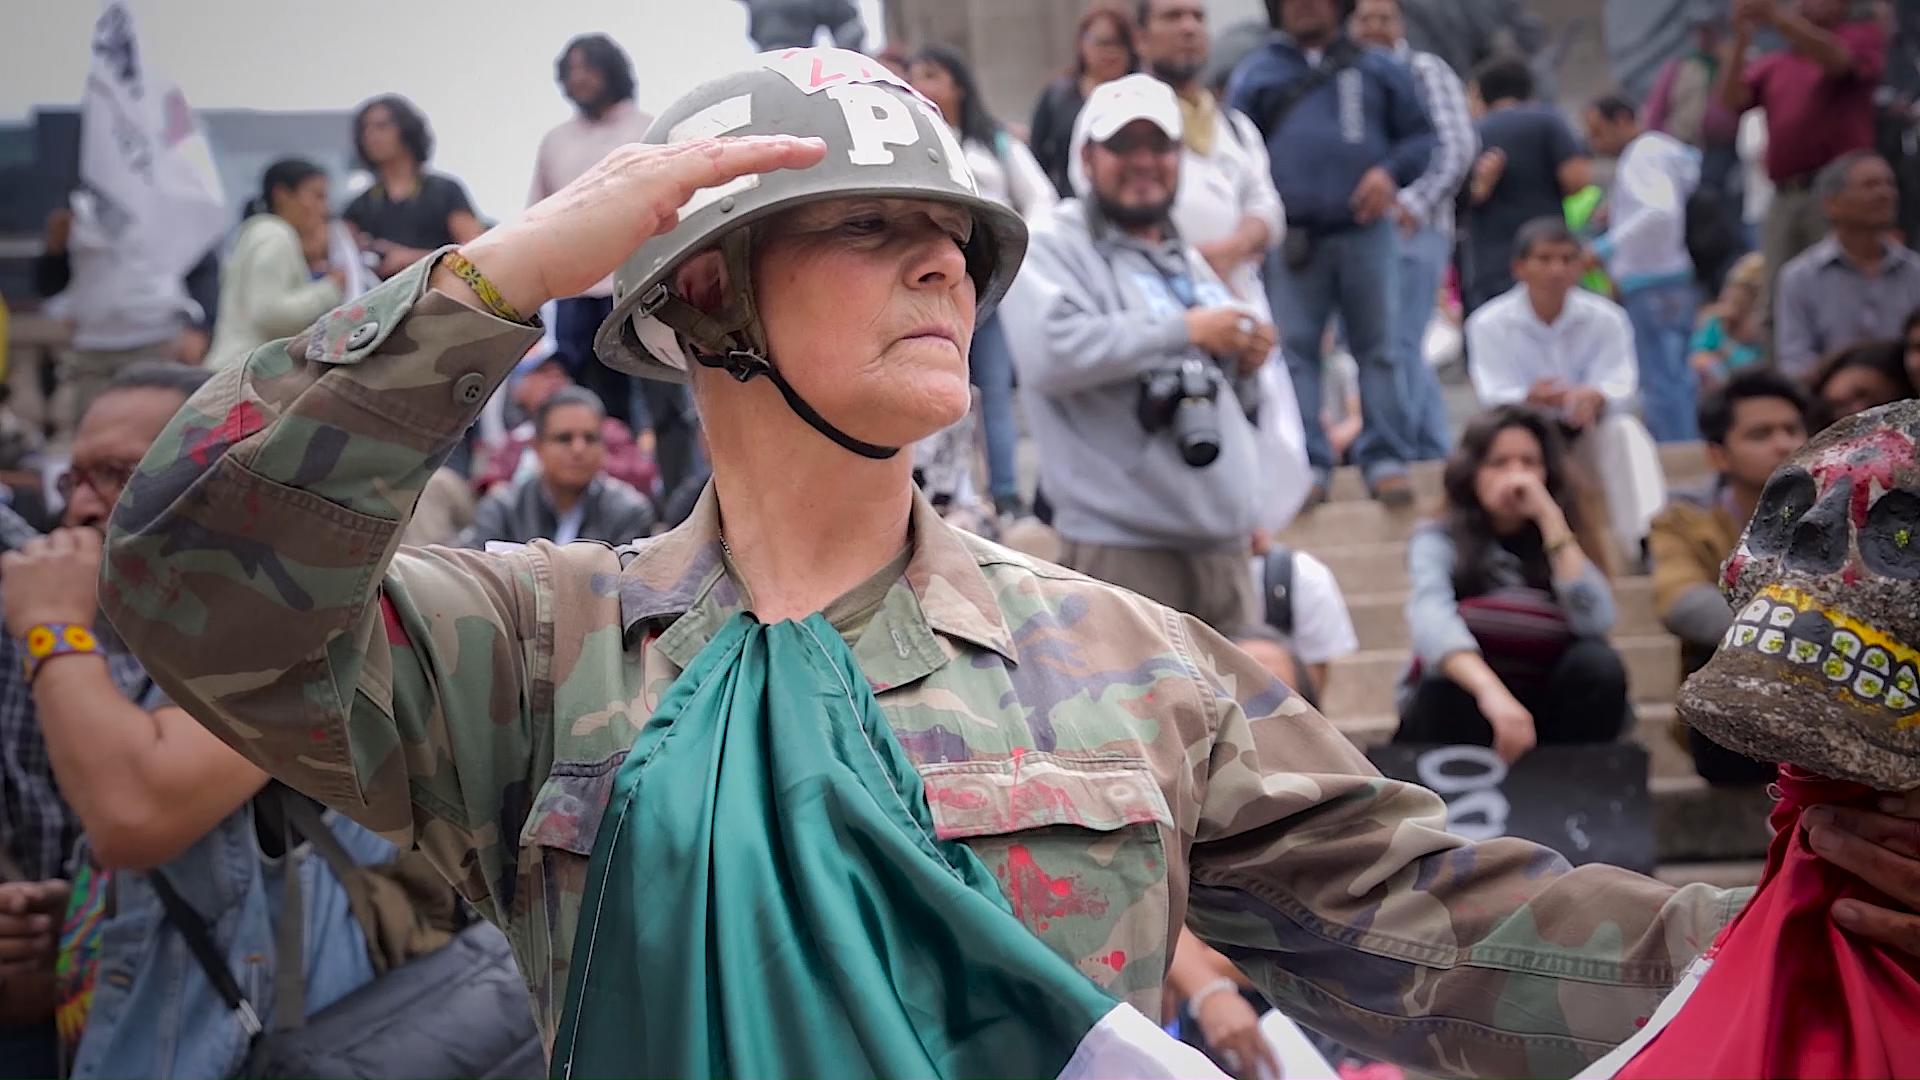 captura-de-pantalla-de-marcha-por-ayotzinapa_cc-mp4